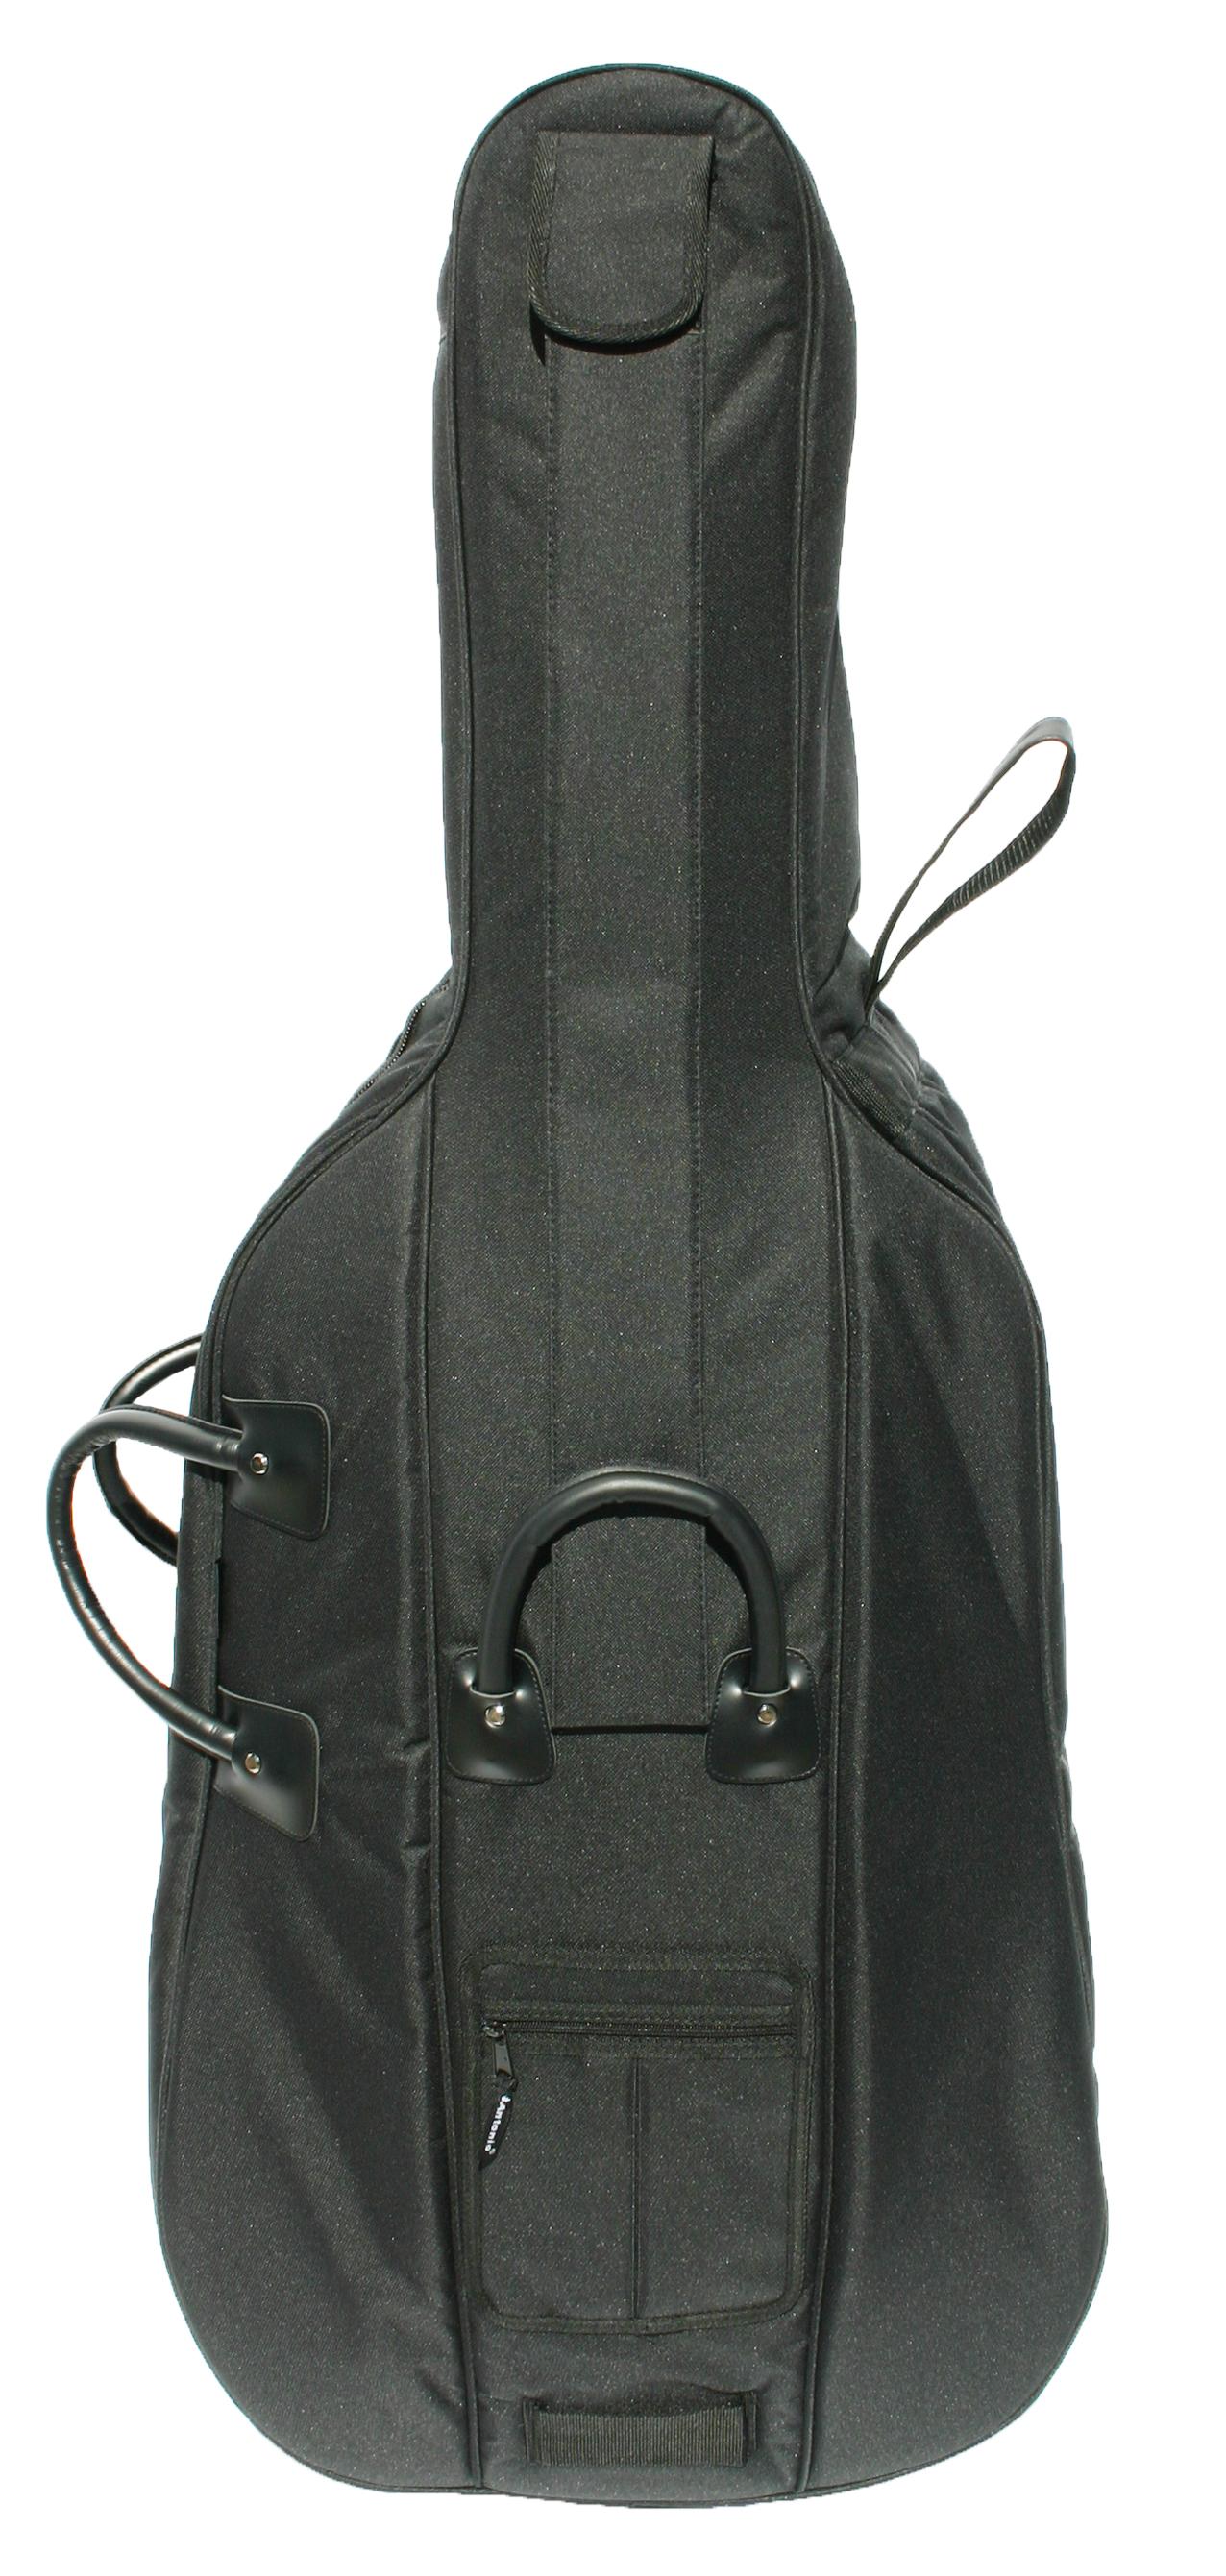 Cellohülle mit 25mm Polsterung